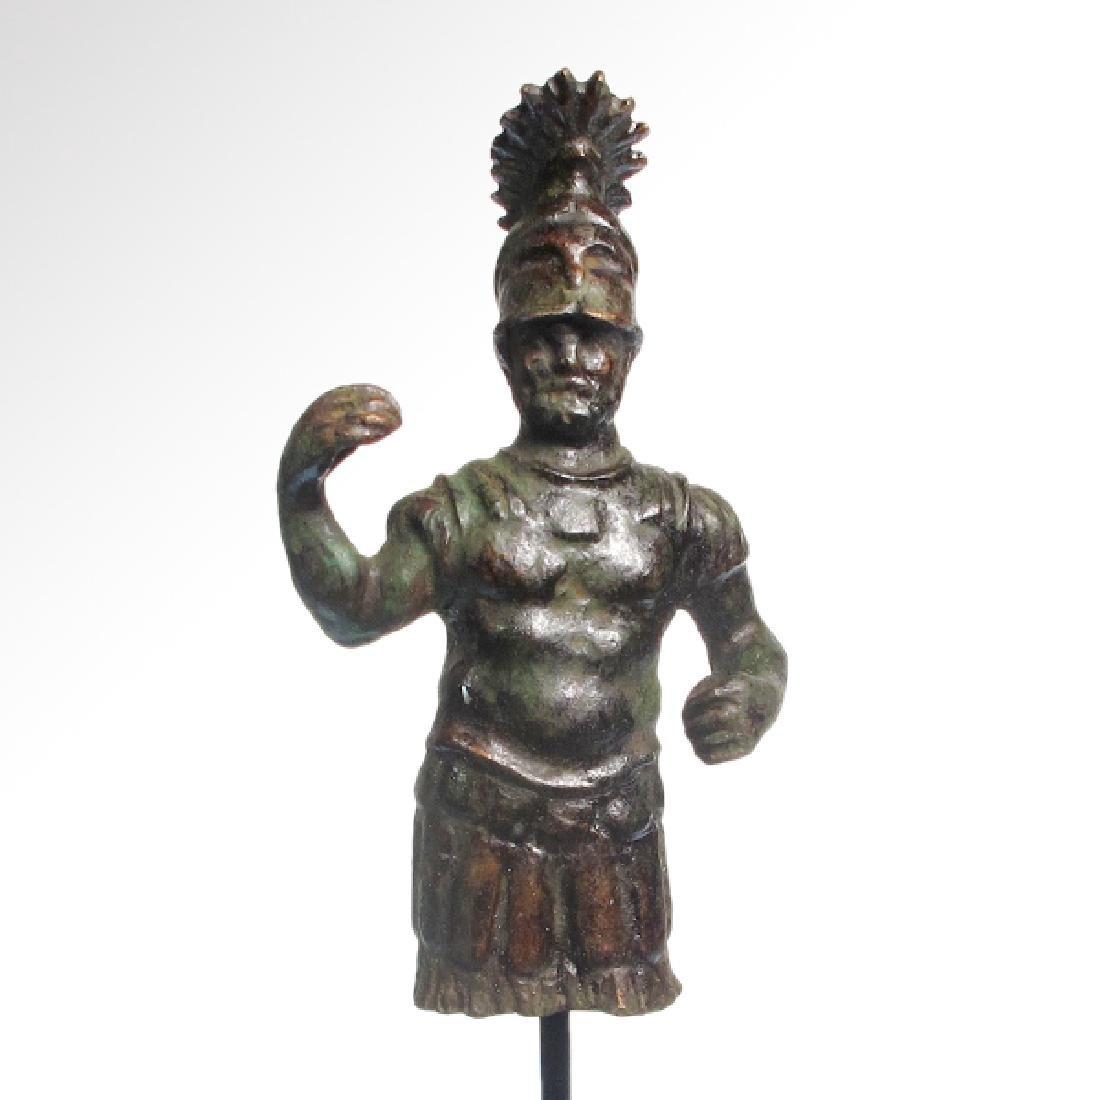 Roman Bronze Figure of Mars, c. 1st-3rd Century A.D.